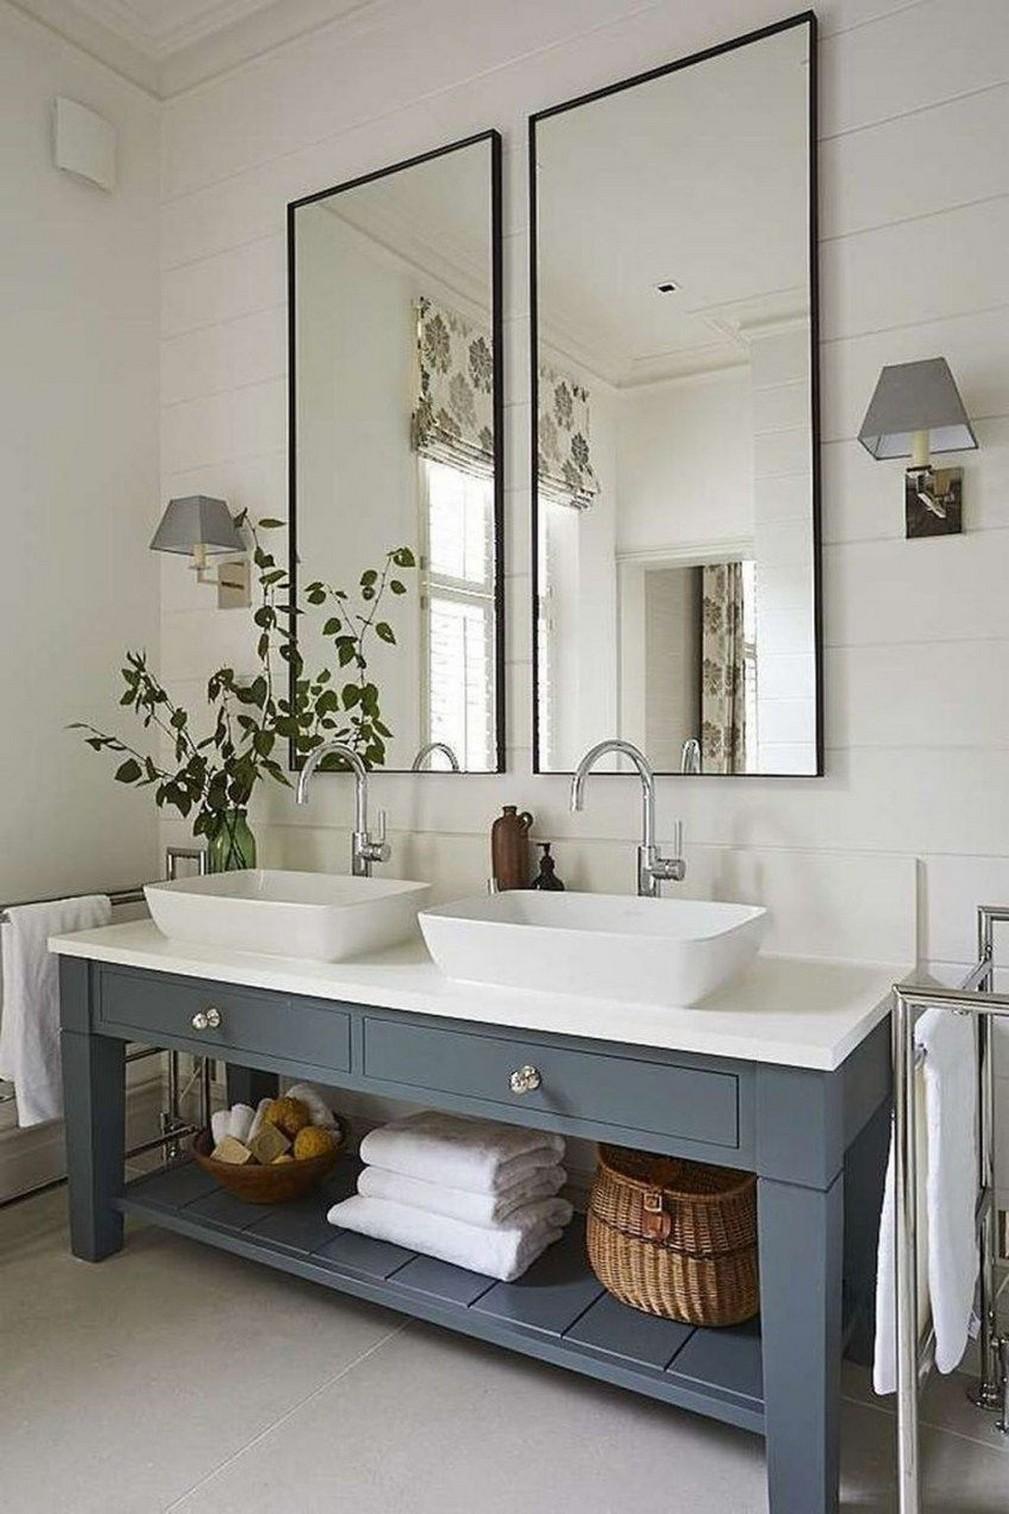 83 Modern Bathroom Design Some Tips Home Decor 33